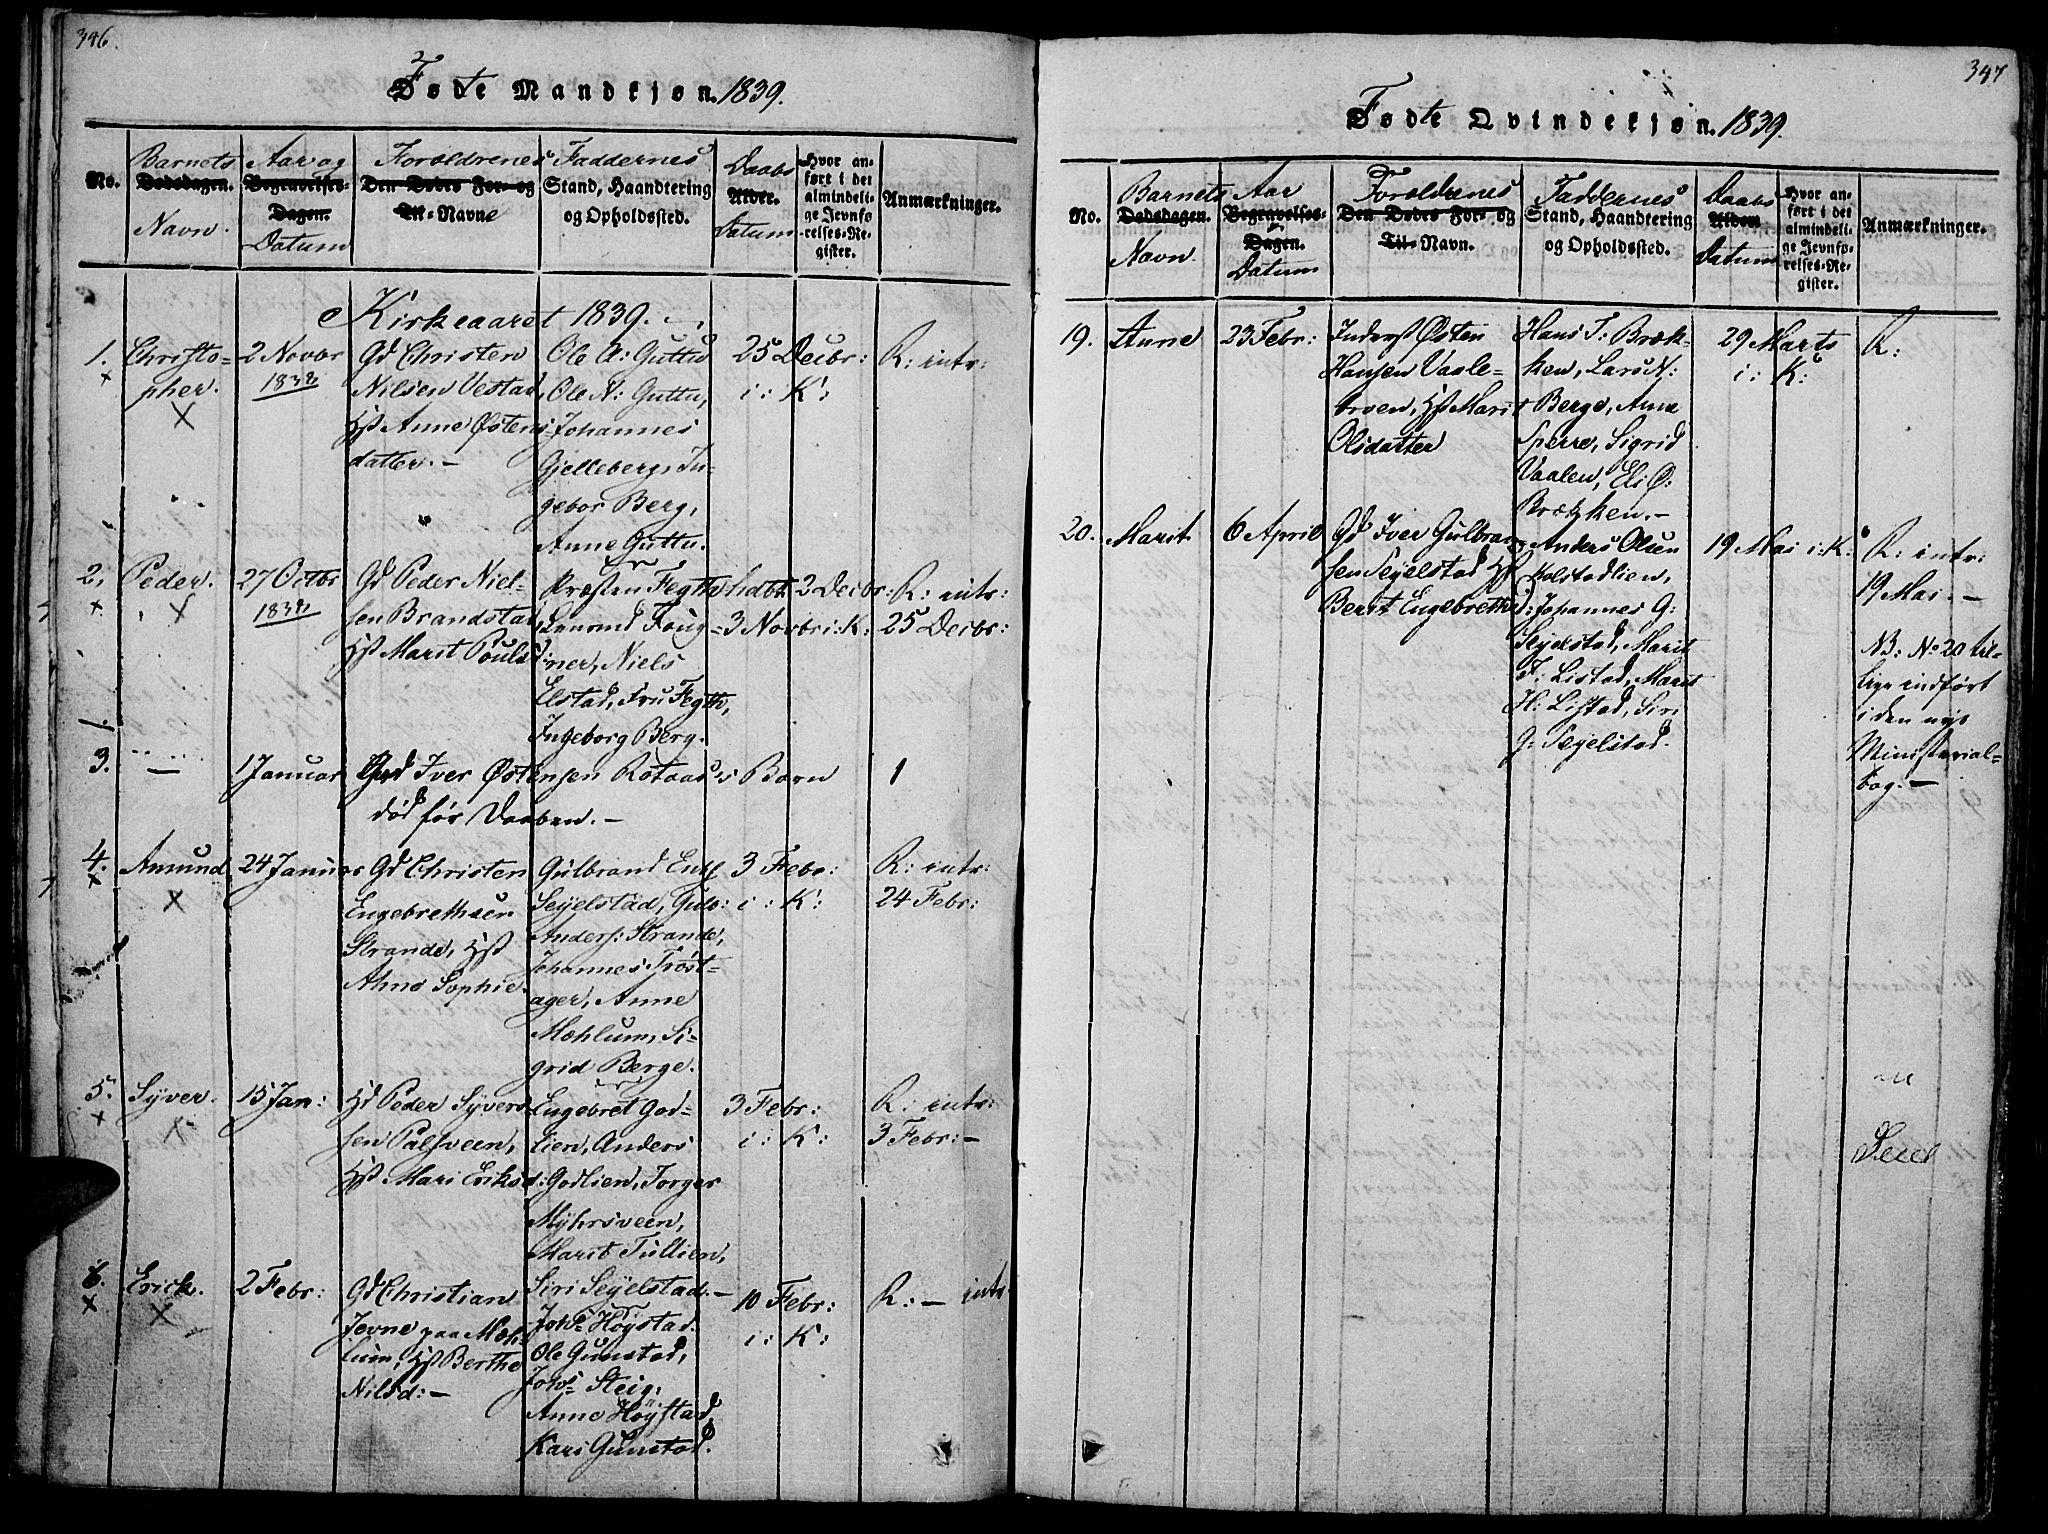 SAH, Ringebu prestekontor, Ministerialbok nr. 4, 1821-1839, s. 346-347